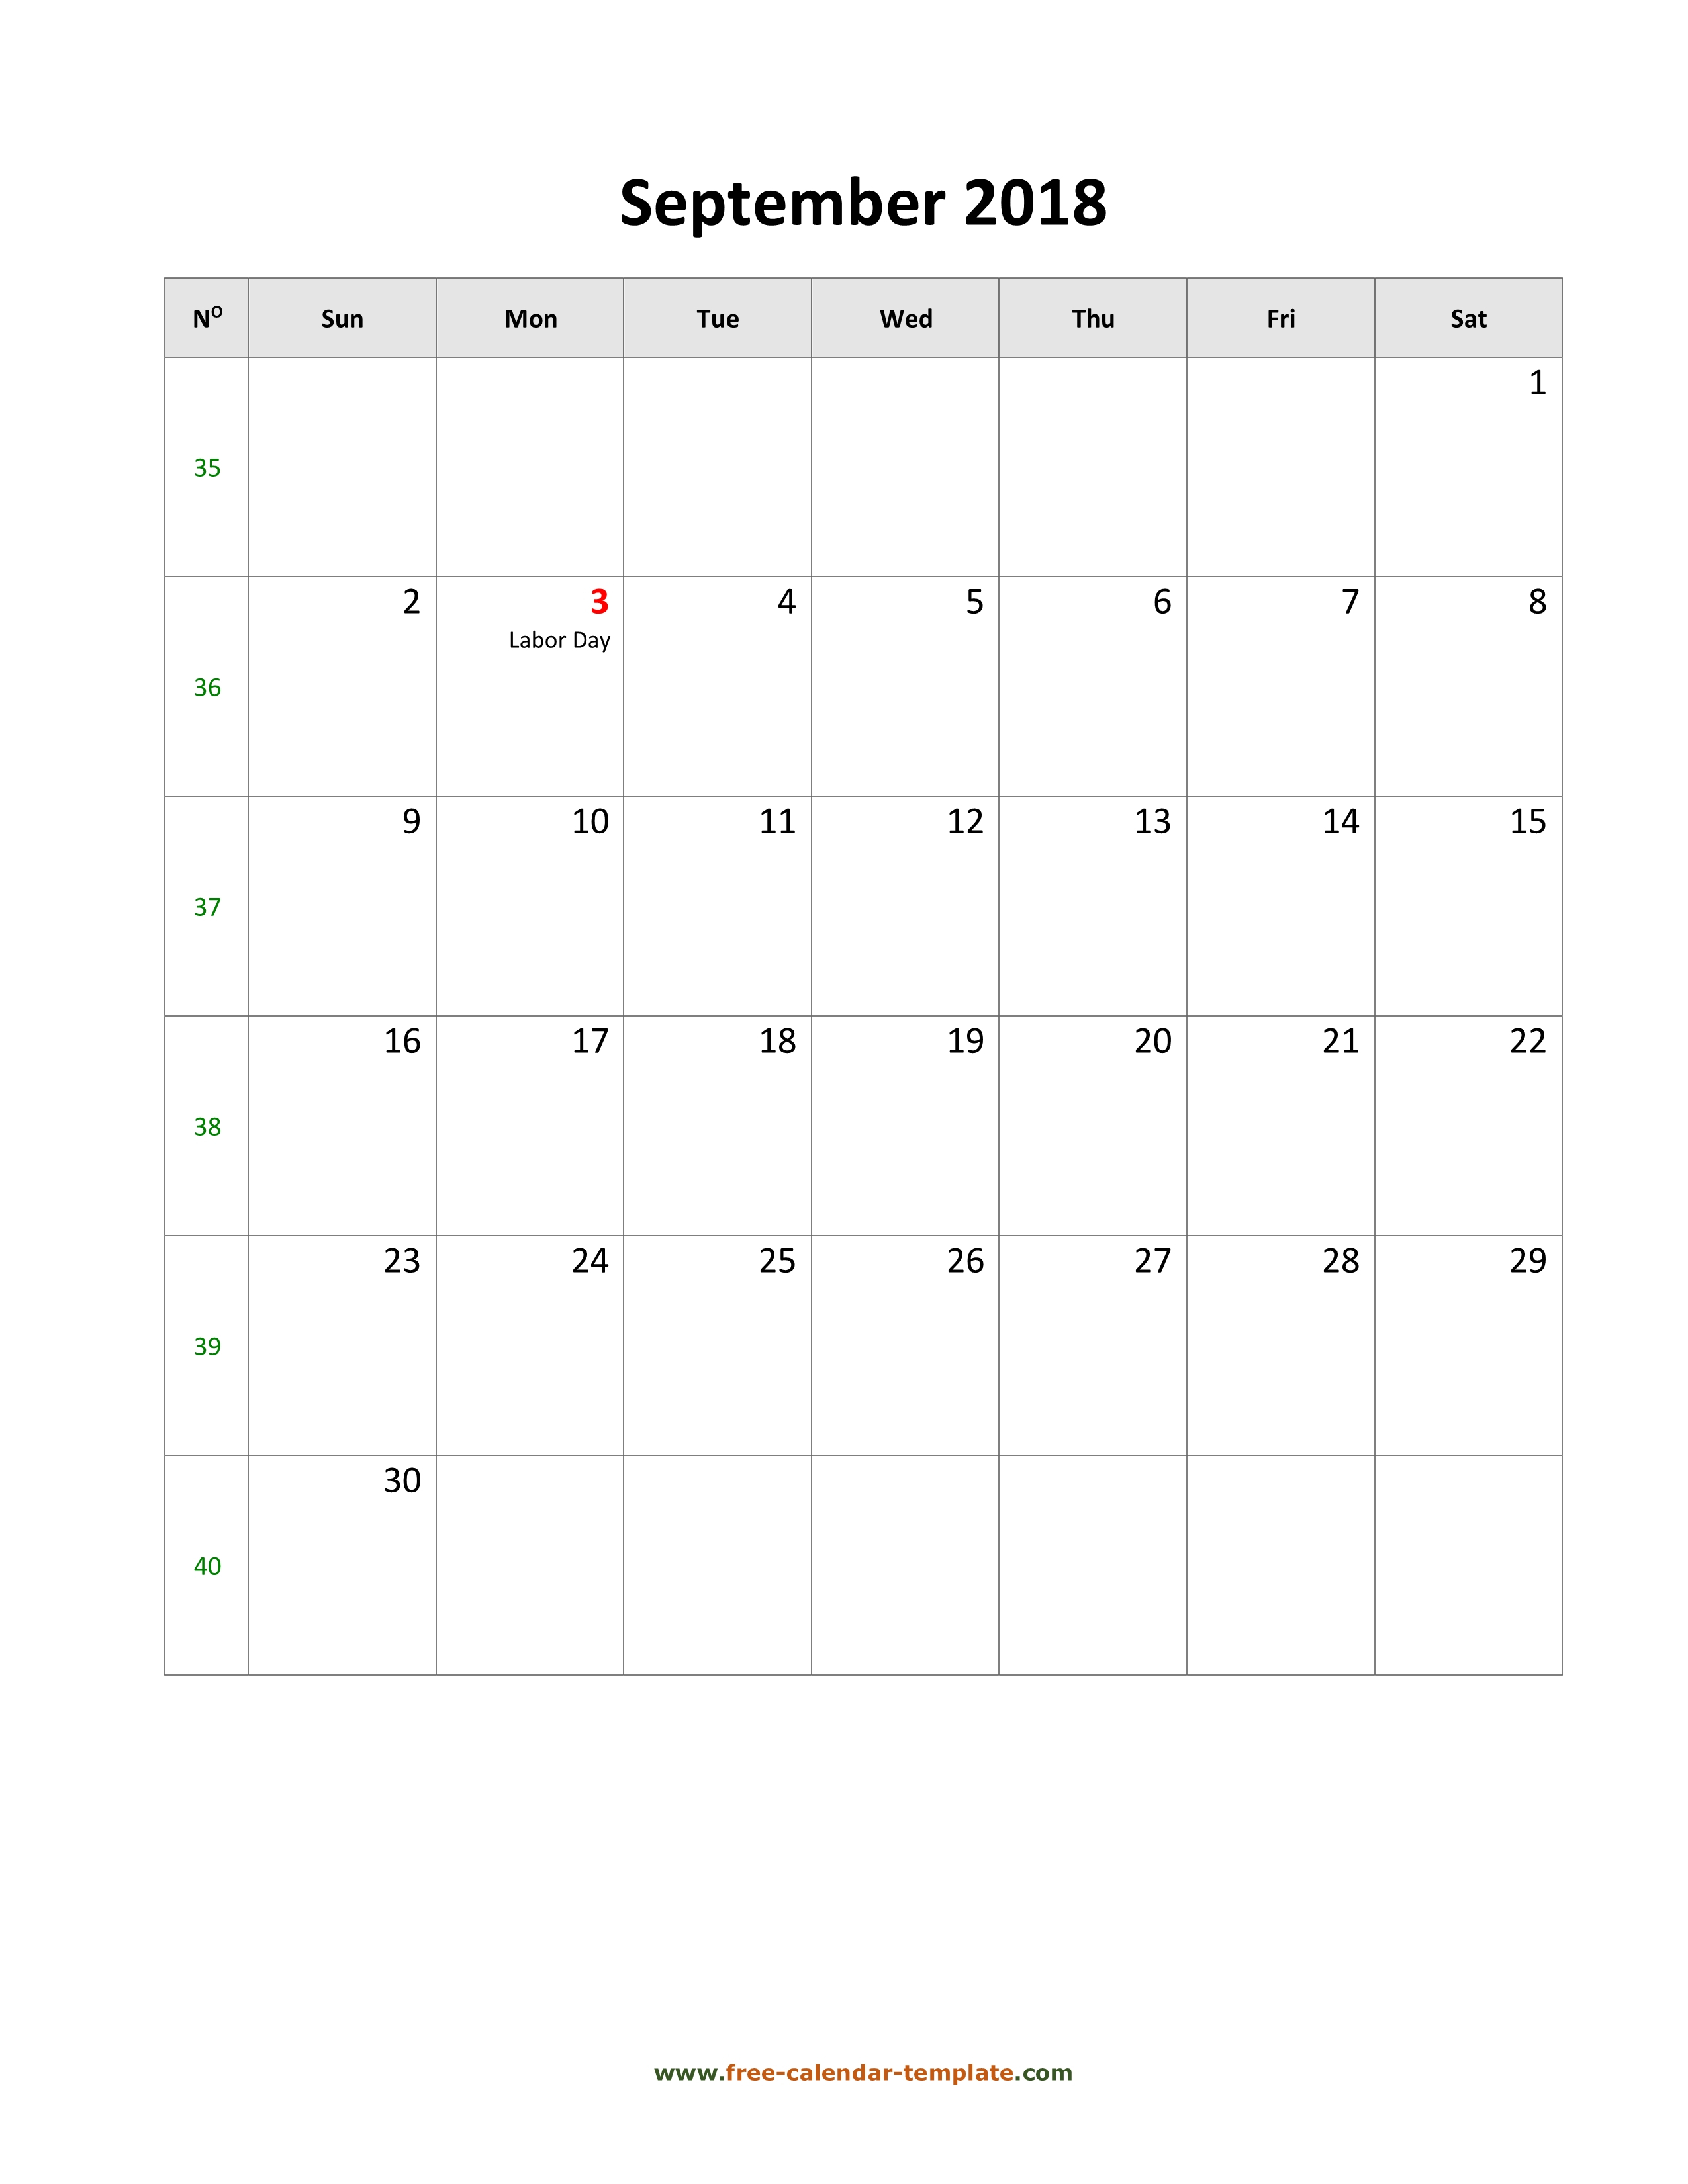 2018 September Calendar (Blank Vertical Template) | Free-Calendar within September Calendar Printable Template Blank